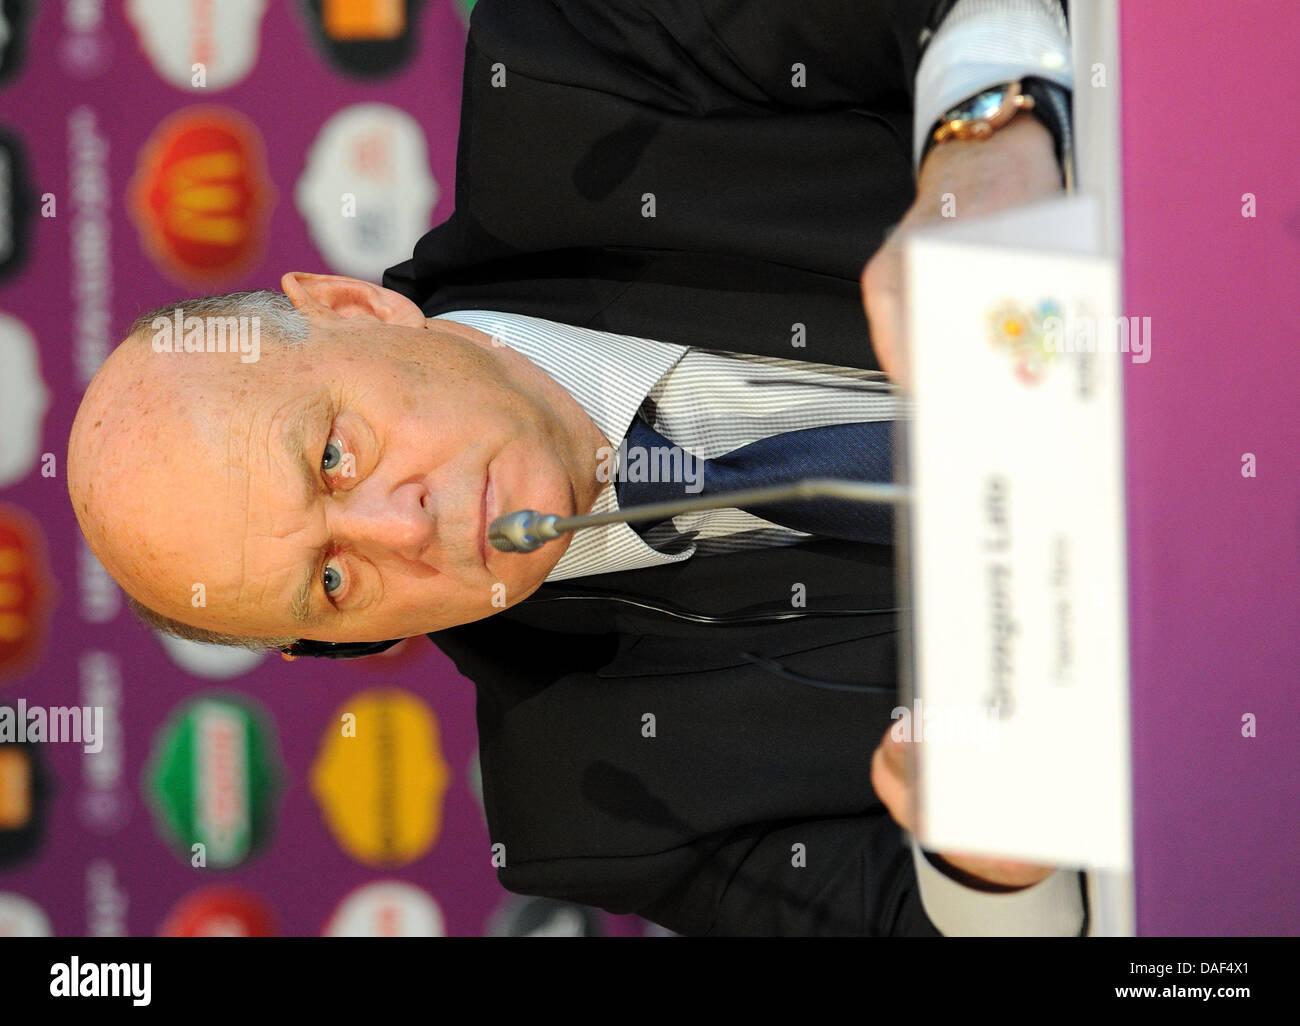 Grzegorz Lato president of the Polish Football Association looks